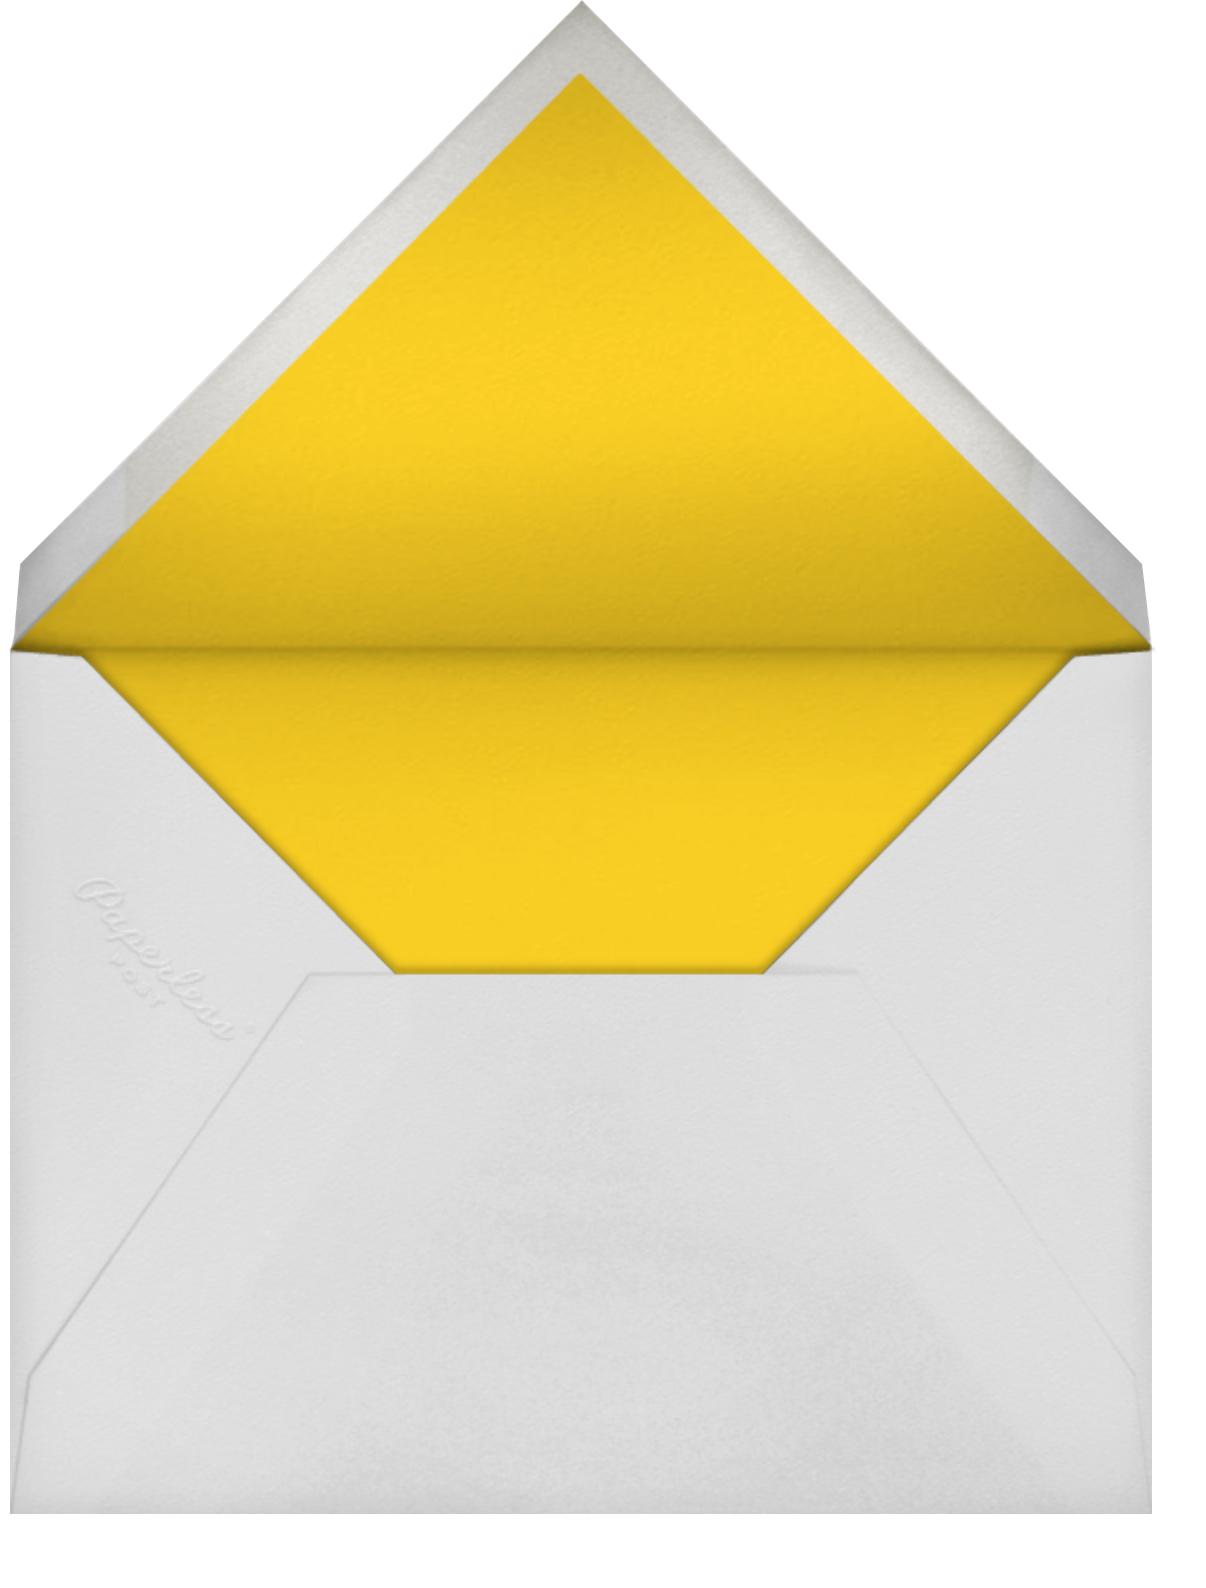 Cadogan Yellow Square - Paperless Post - General entertaining - envelope back